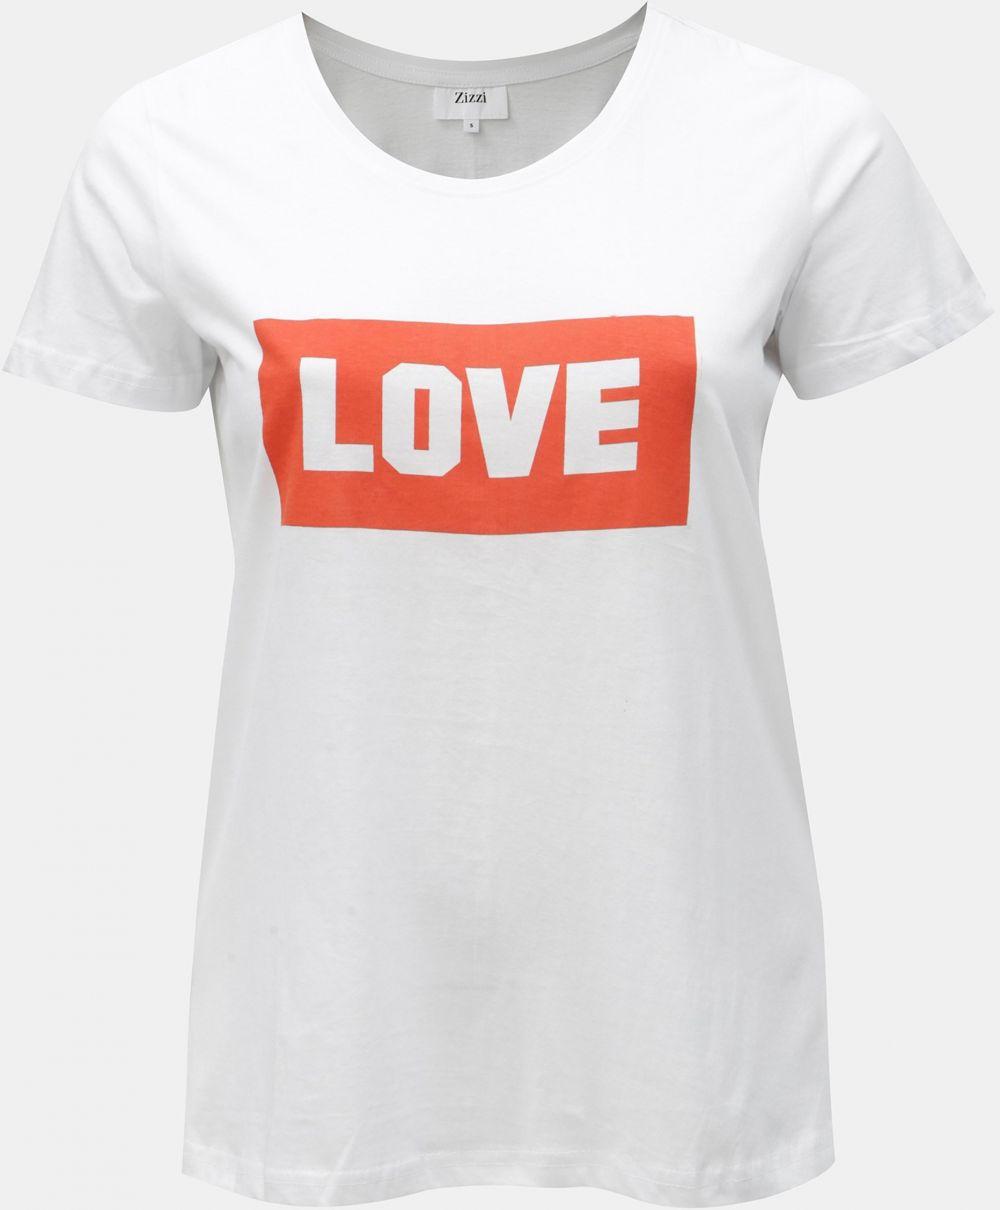 7779420ec84c Biele tričko s potlačou Zizzi značky Zizzi - Lovely.sk